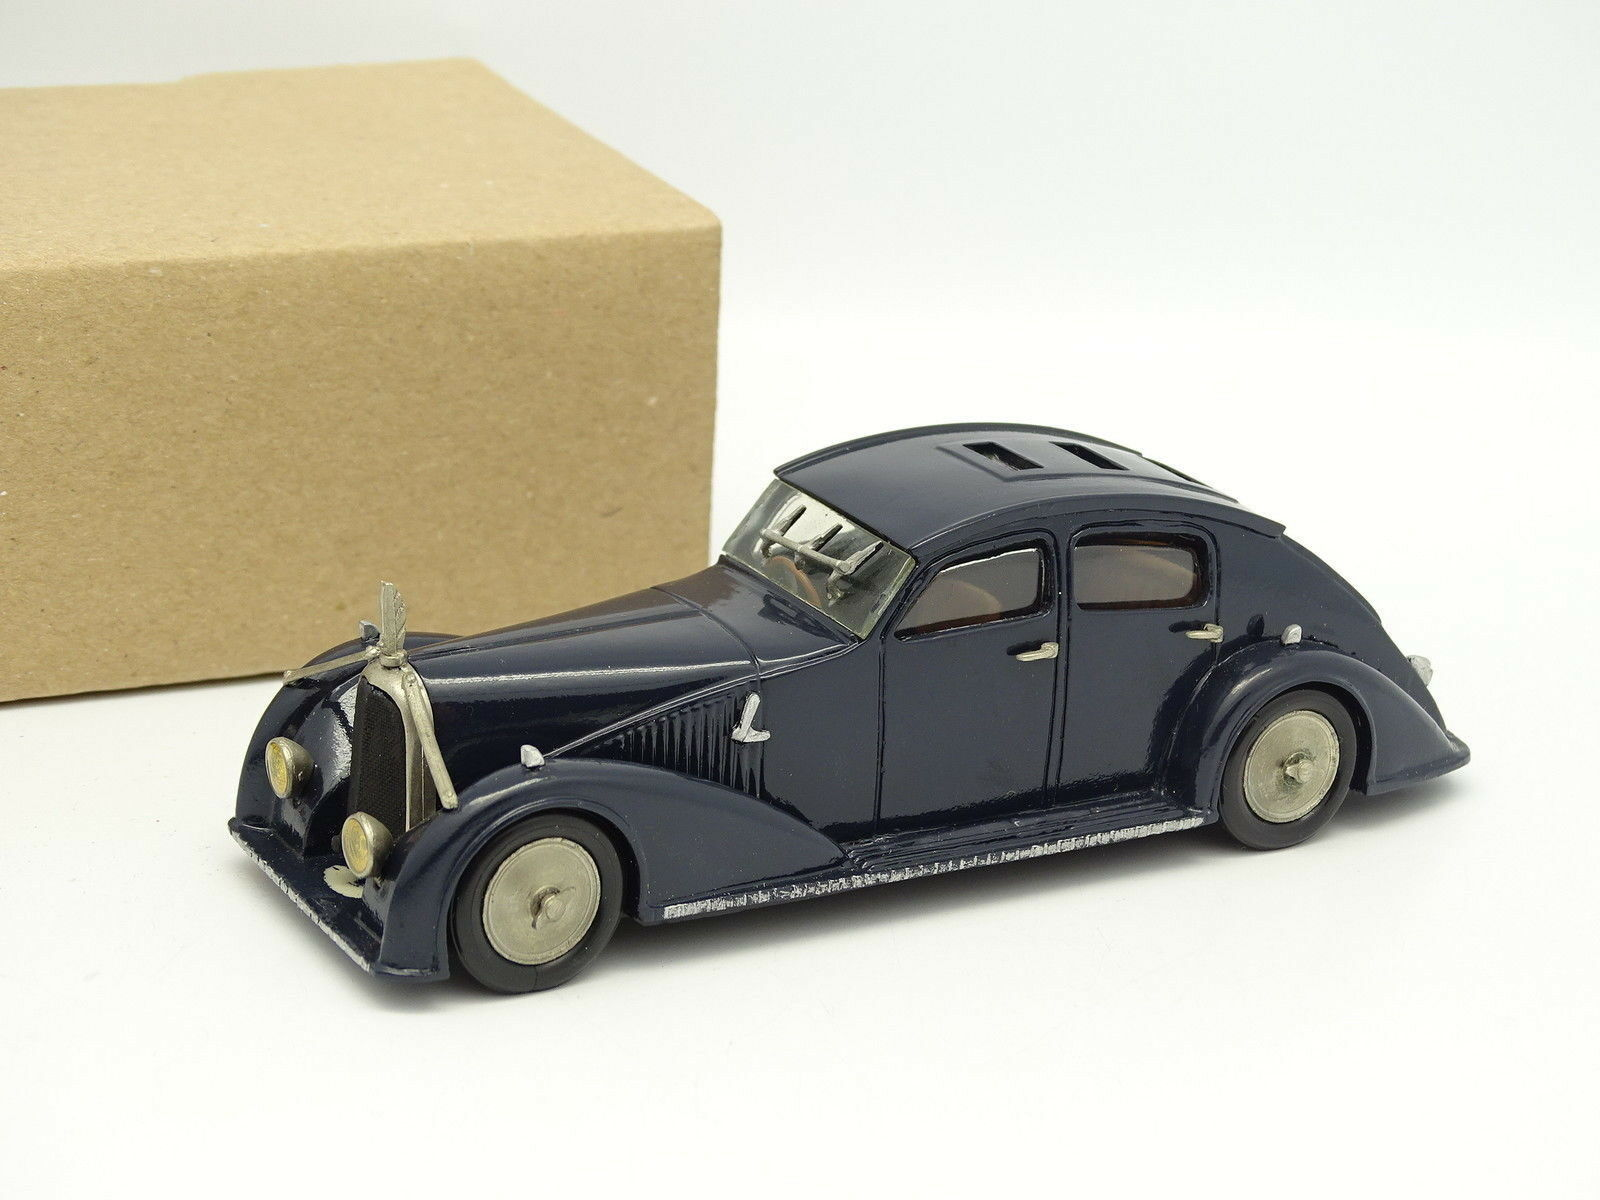 Epokit Kit Monté Harz 1 43 - Nachbar C28 1938 Blau